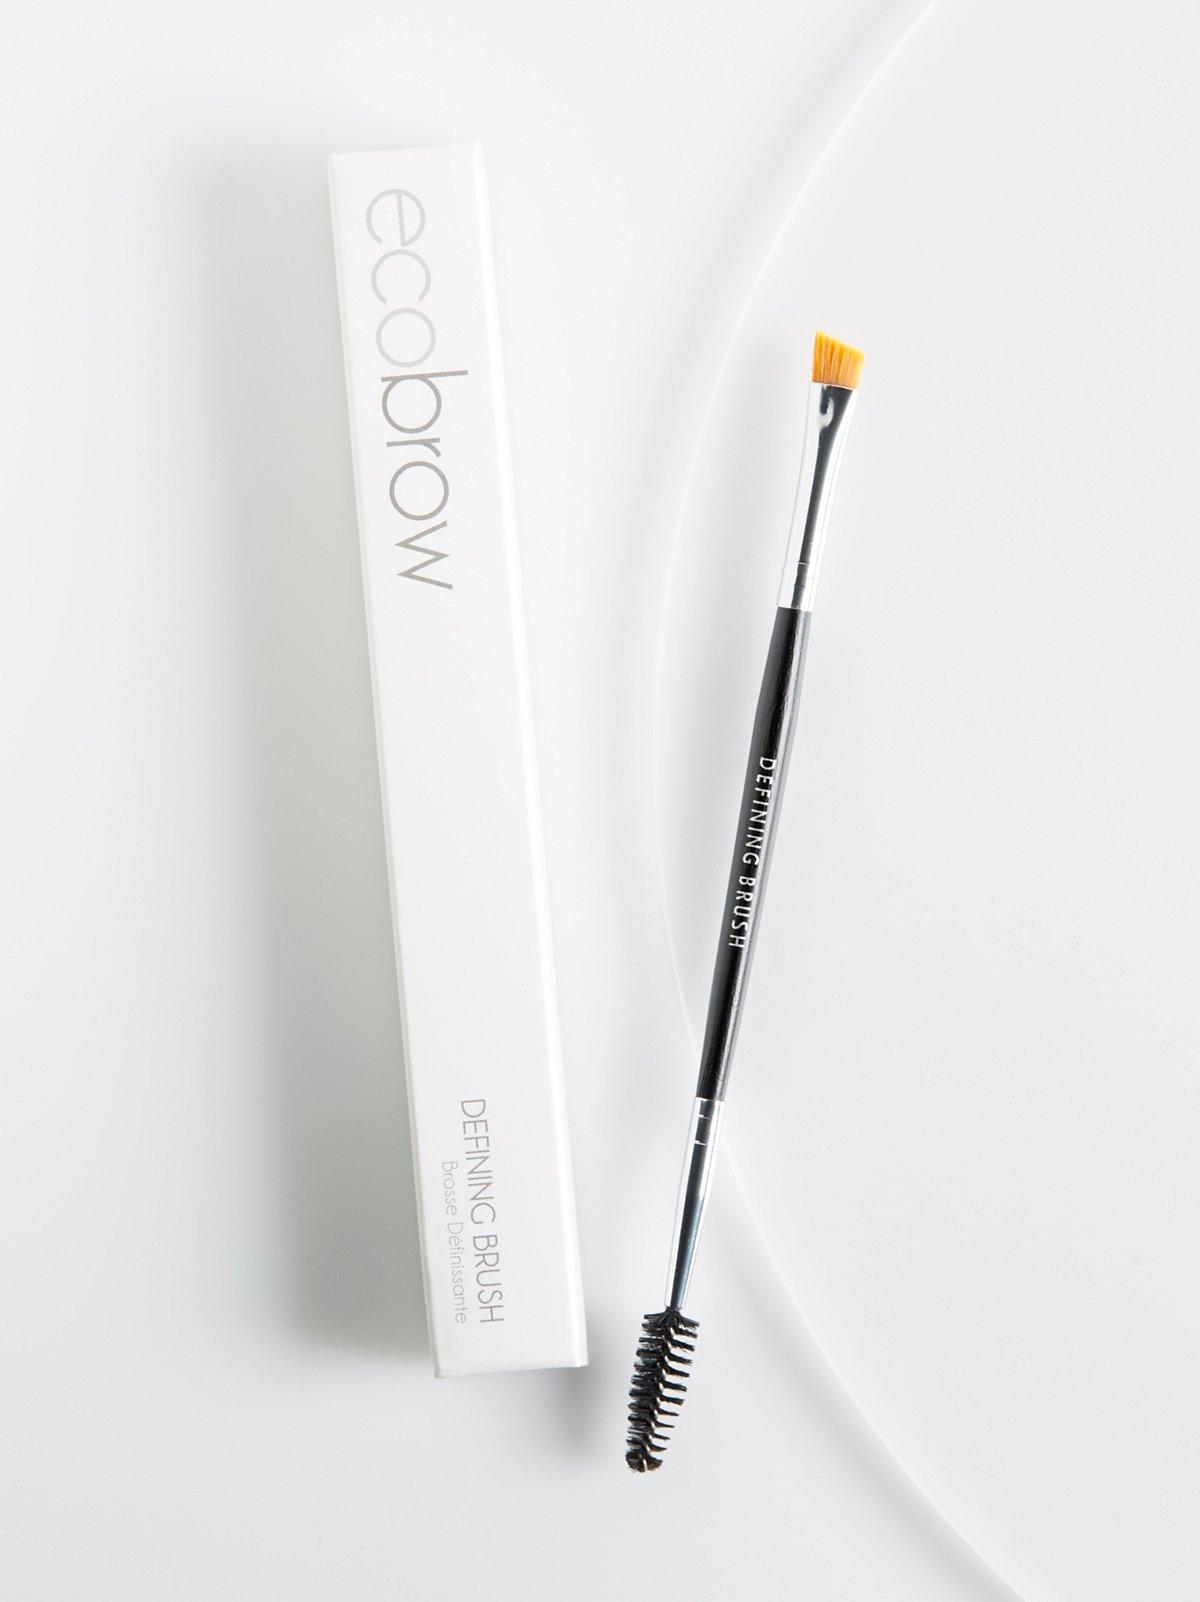 Ecobrow Defining眉笔刷